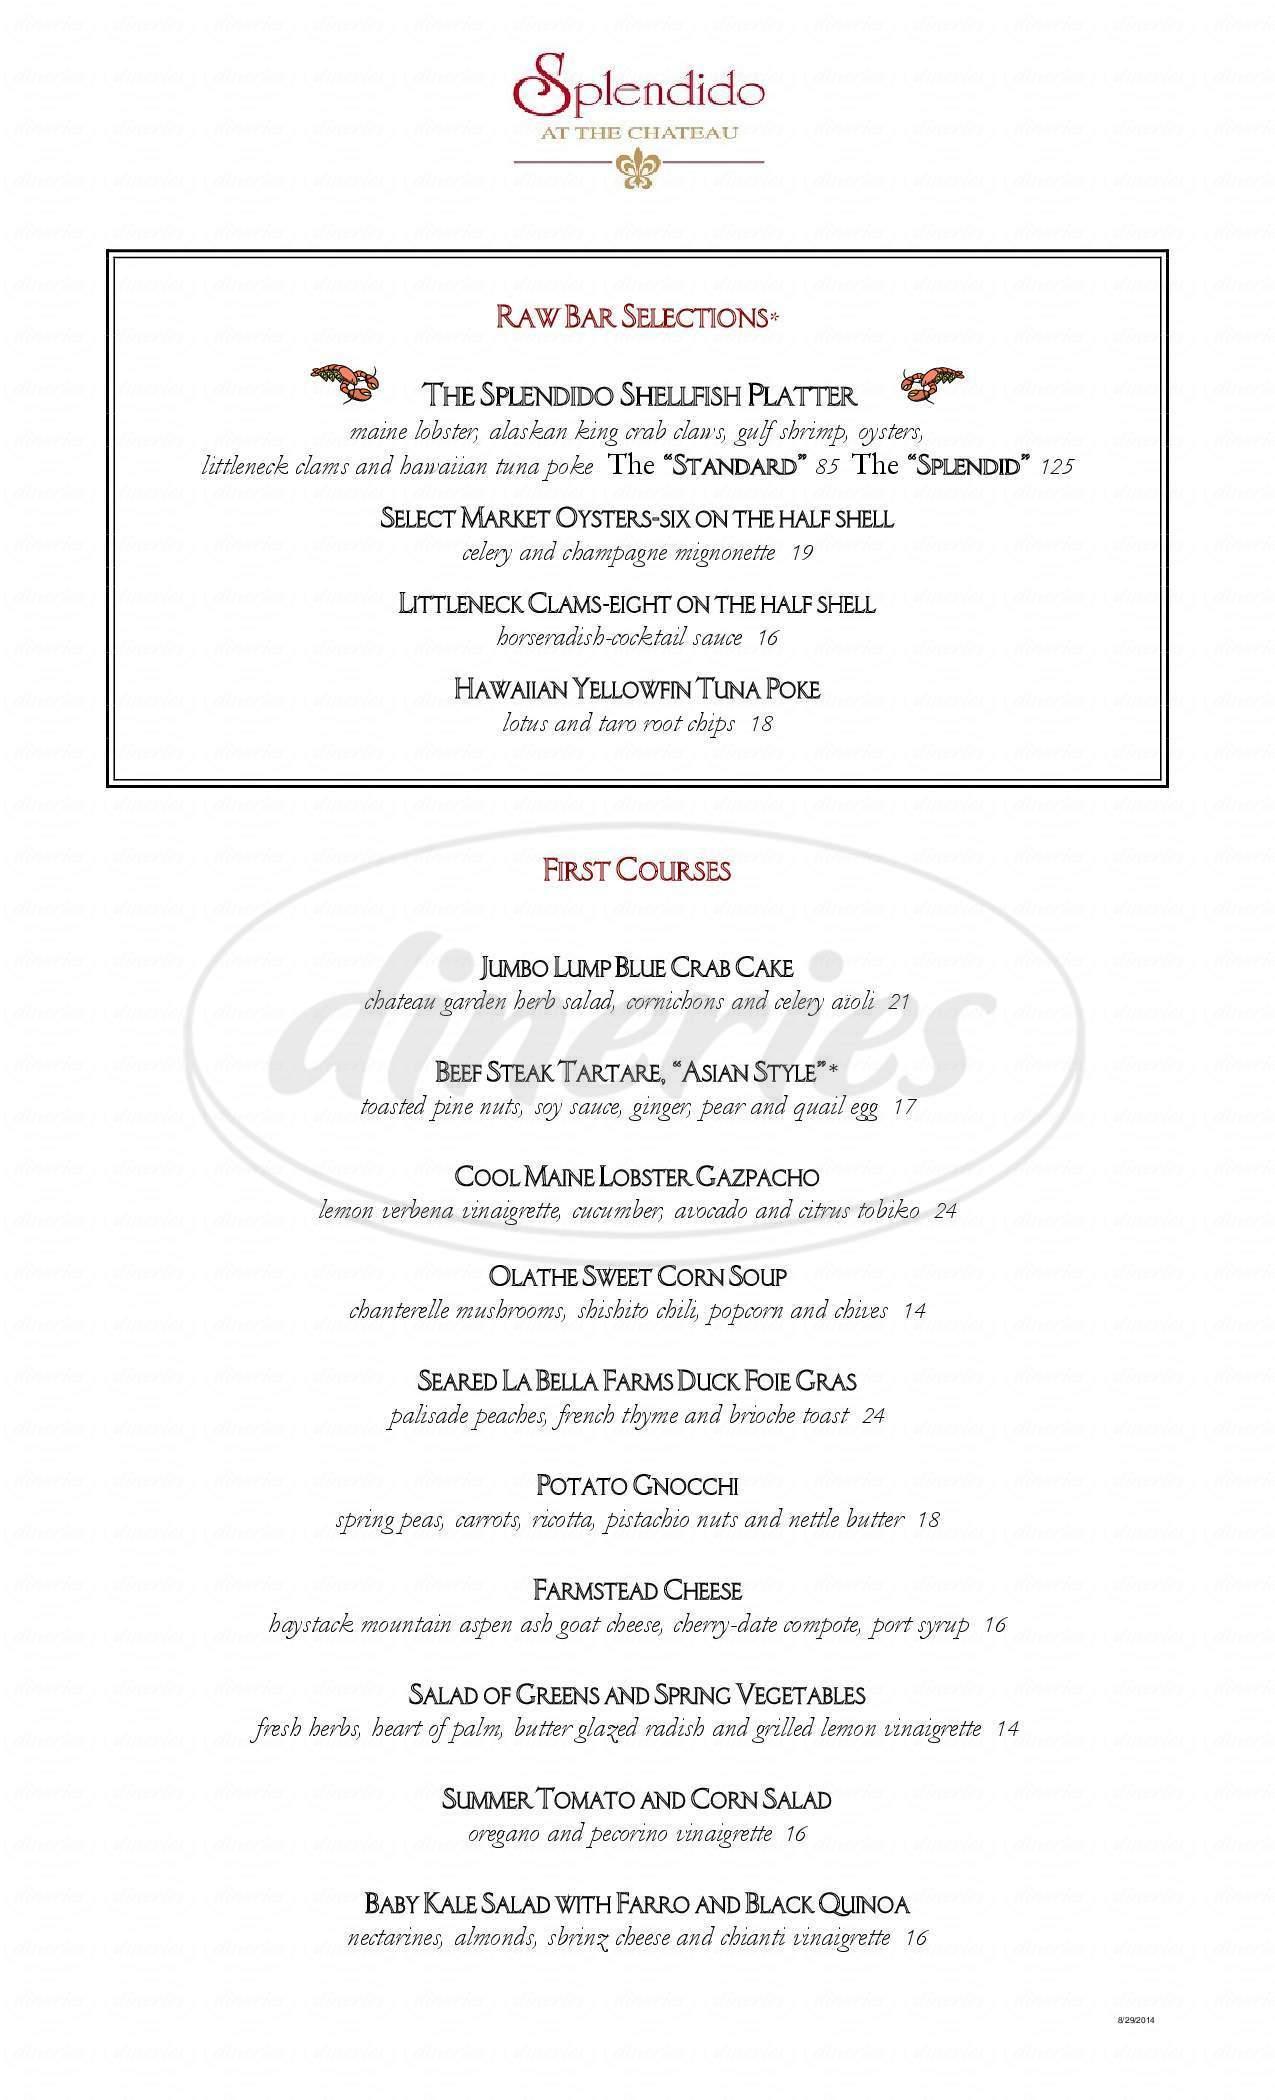 menu for Splendido at the Chateau